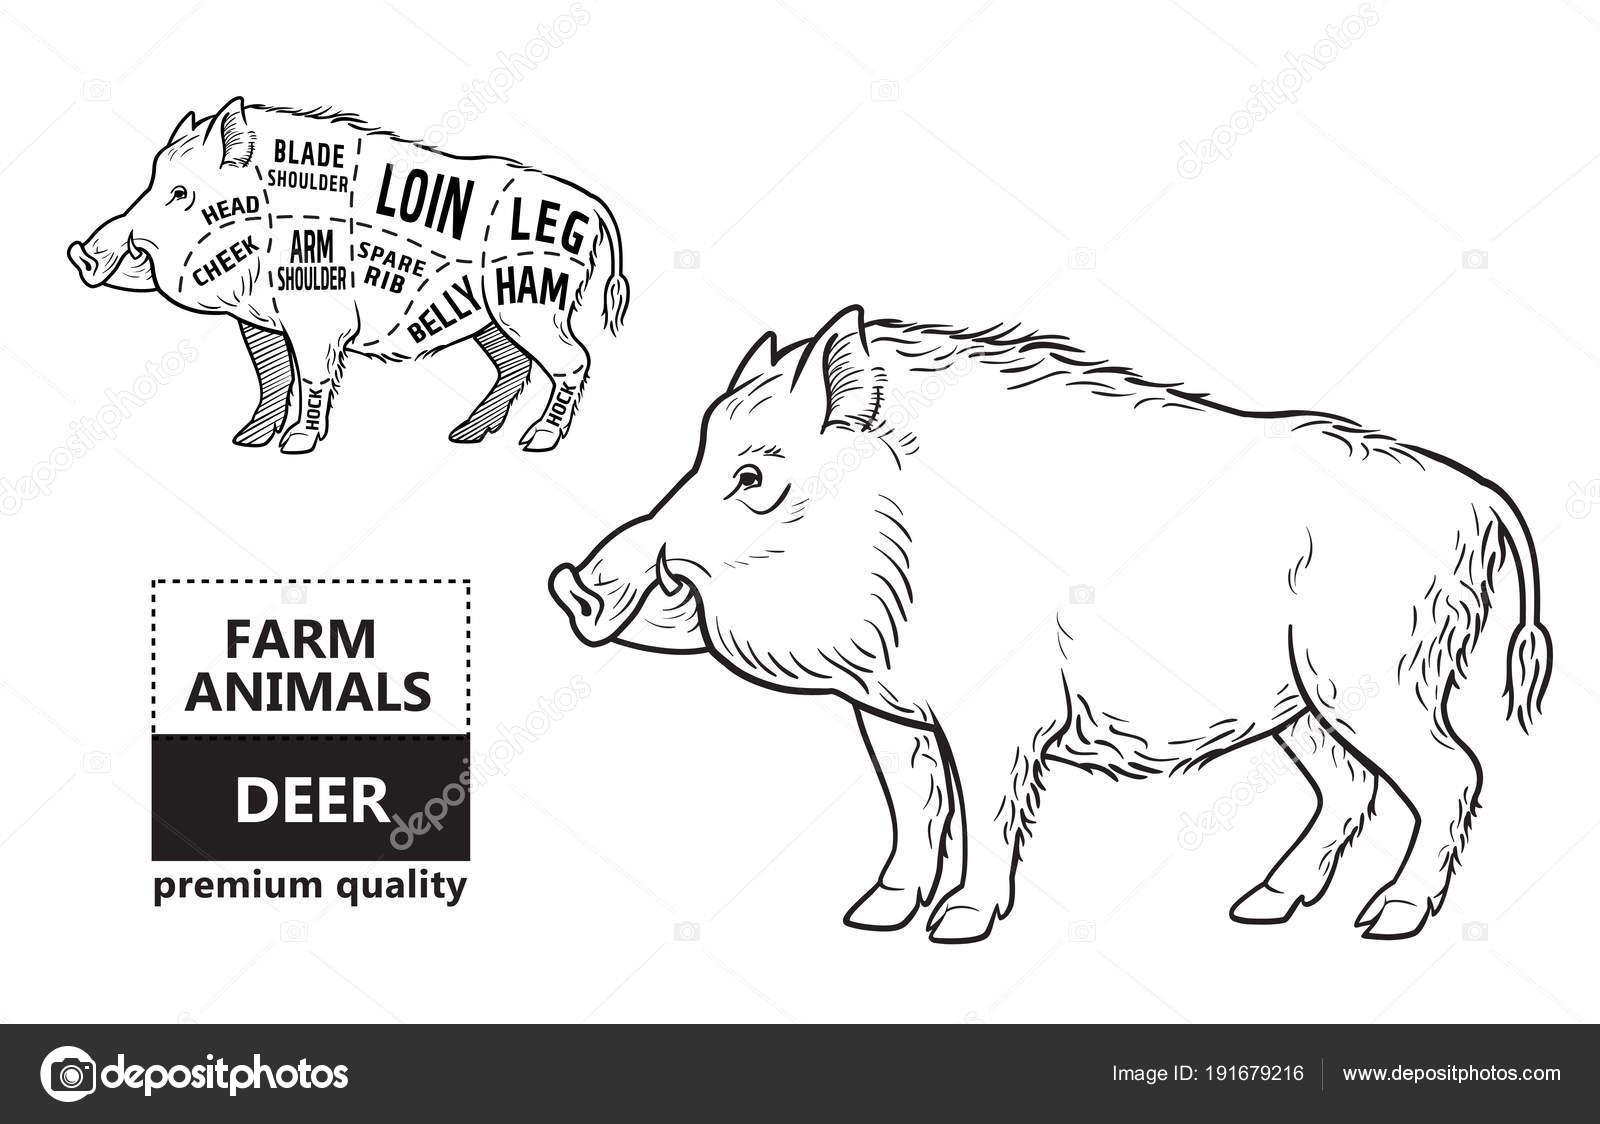 Lion Meat Cuts Diagram Car Wiring Diagrams Explained Chickencutsdiagram Wild Hog Boar Game Cut Scheme Elements Set On Rh Depositphotos Com Chicken Beef Steak